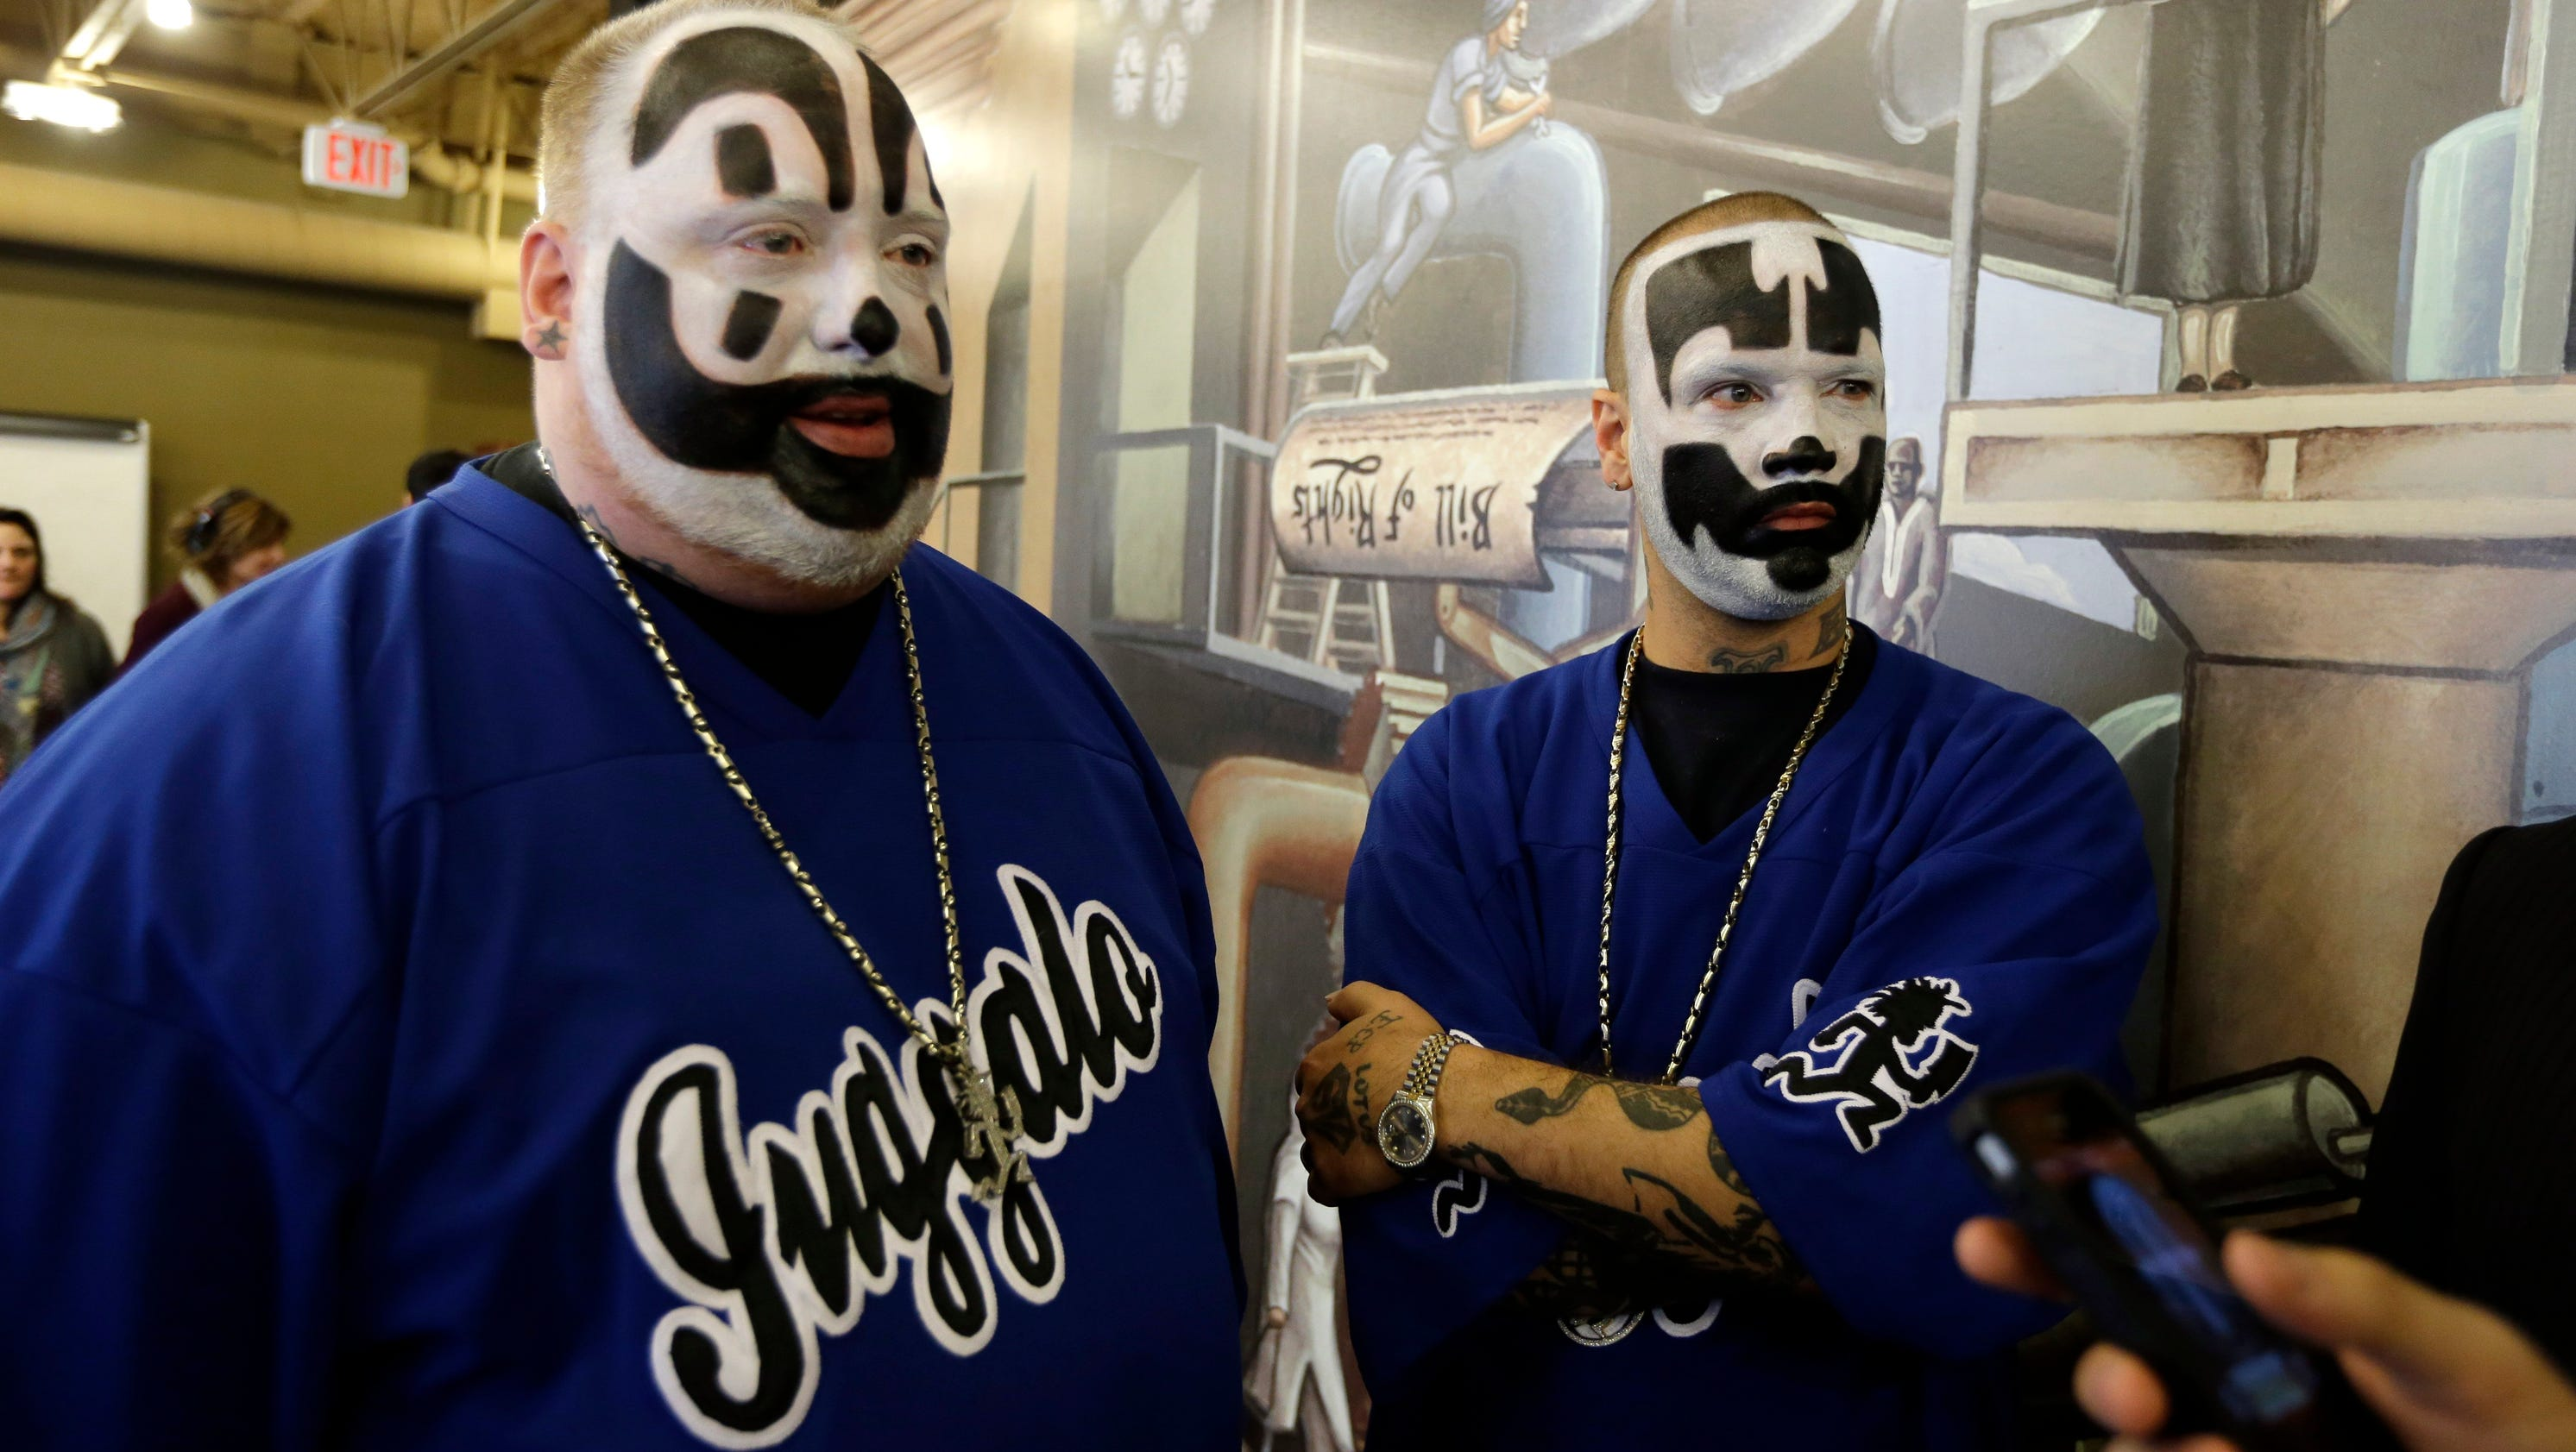 insane clown posse dating Letra de 'dating game' de insane clown posse (host intro), let's meet contestant #1, he's a schitzophrenic serial killer aquí encontrarás la letra completa de dating game interpretada.